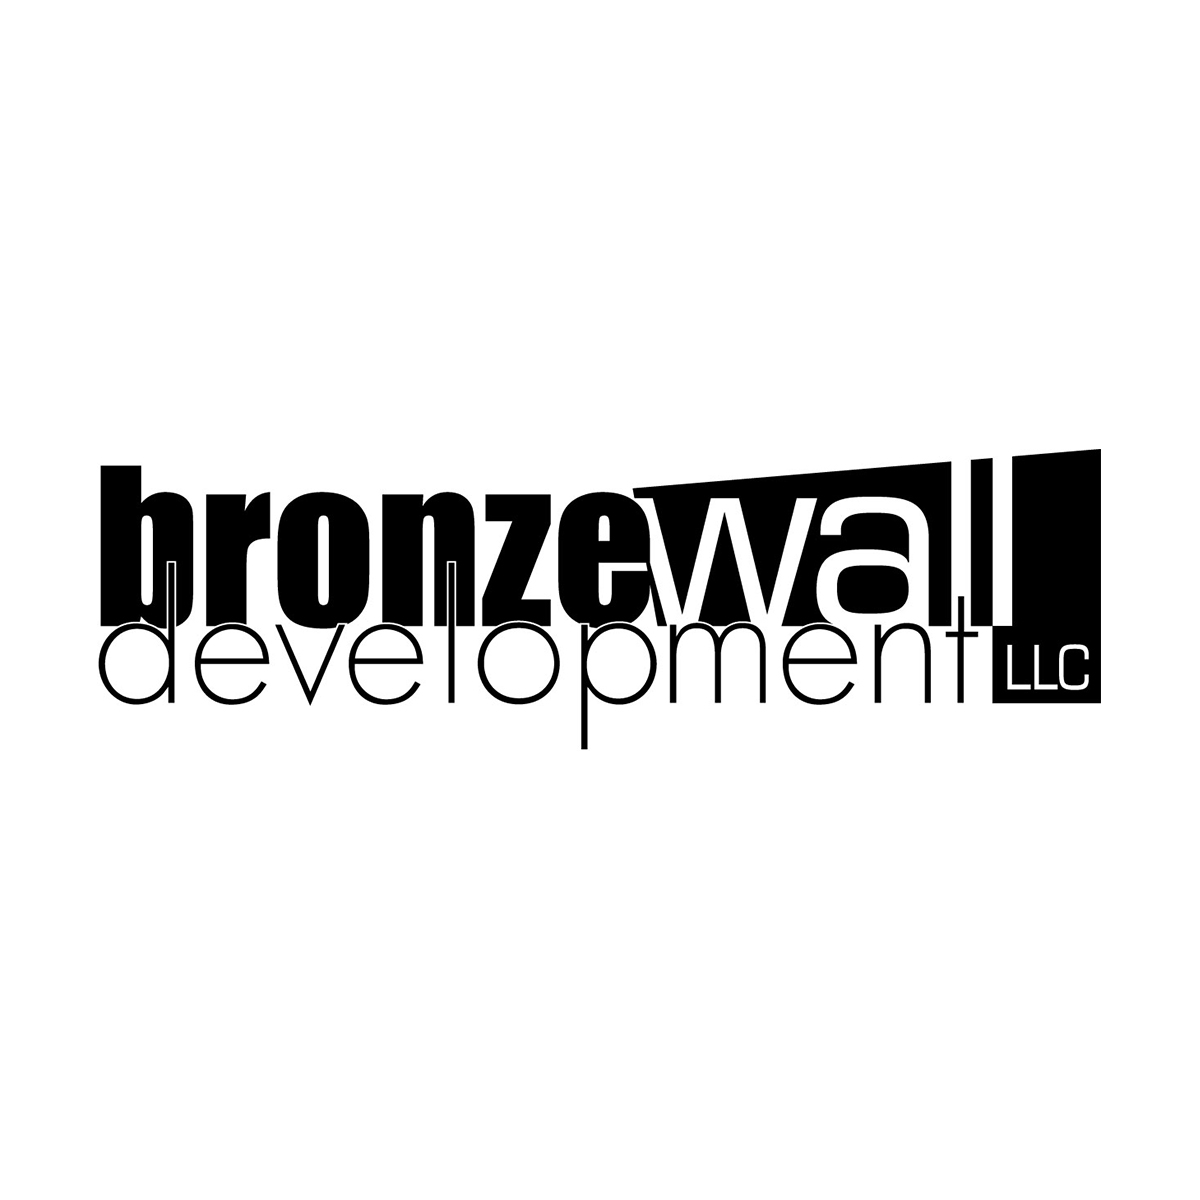 bronzewall.jpg